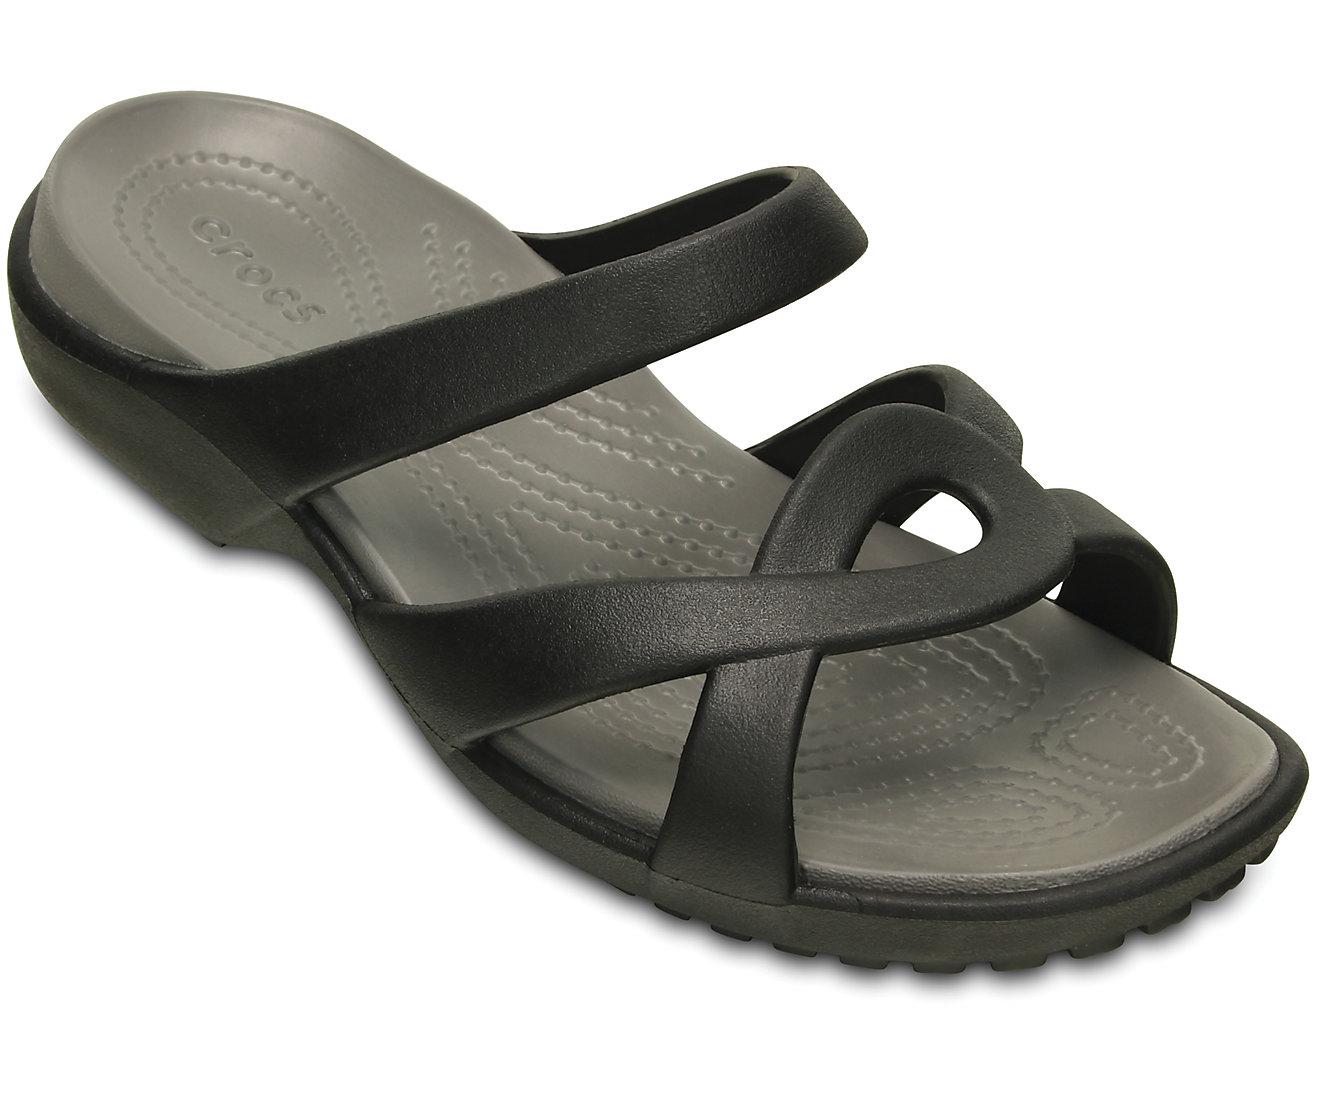 Crocs Women's Meleen Twist Sandal 202497 Black/Smoke Μαύρο